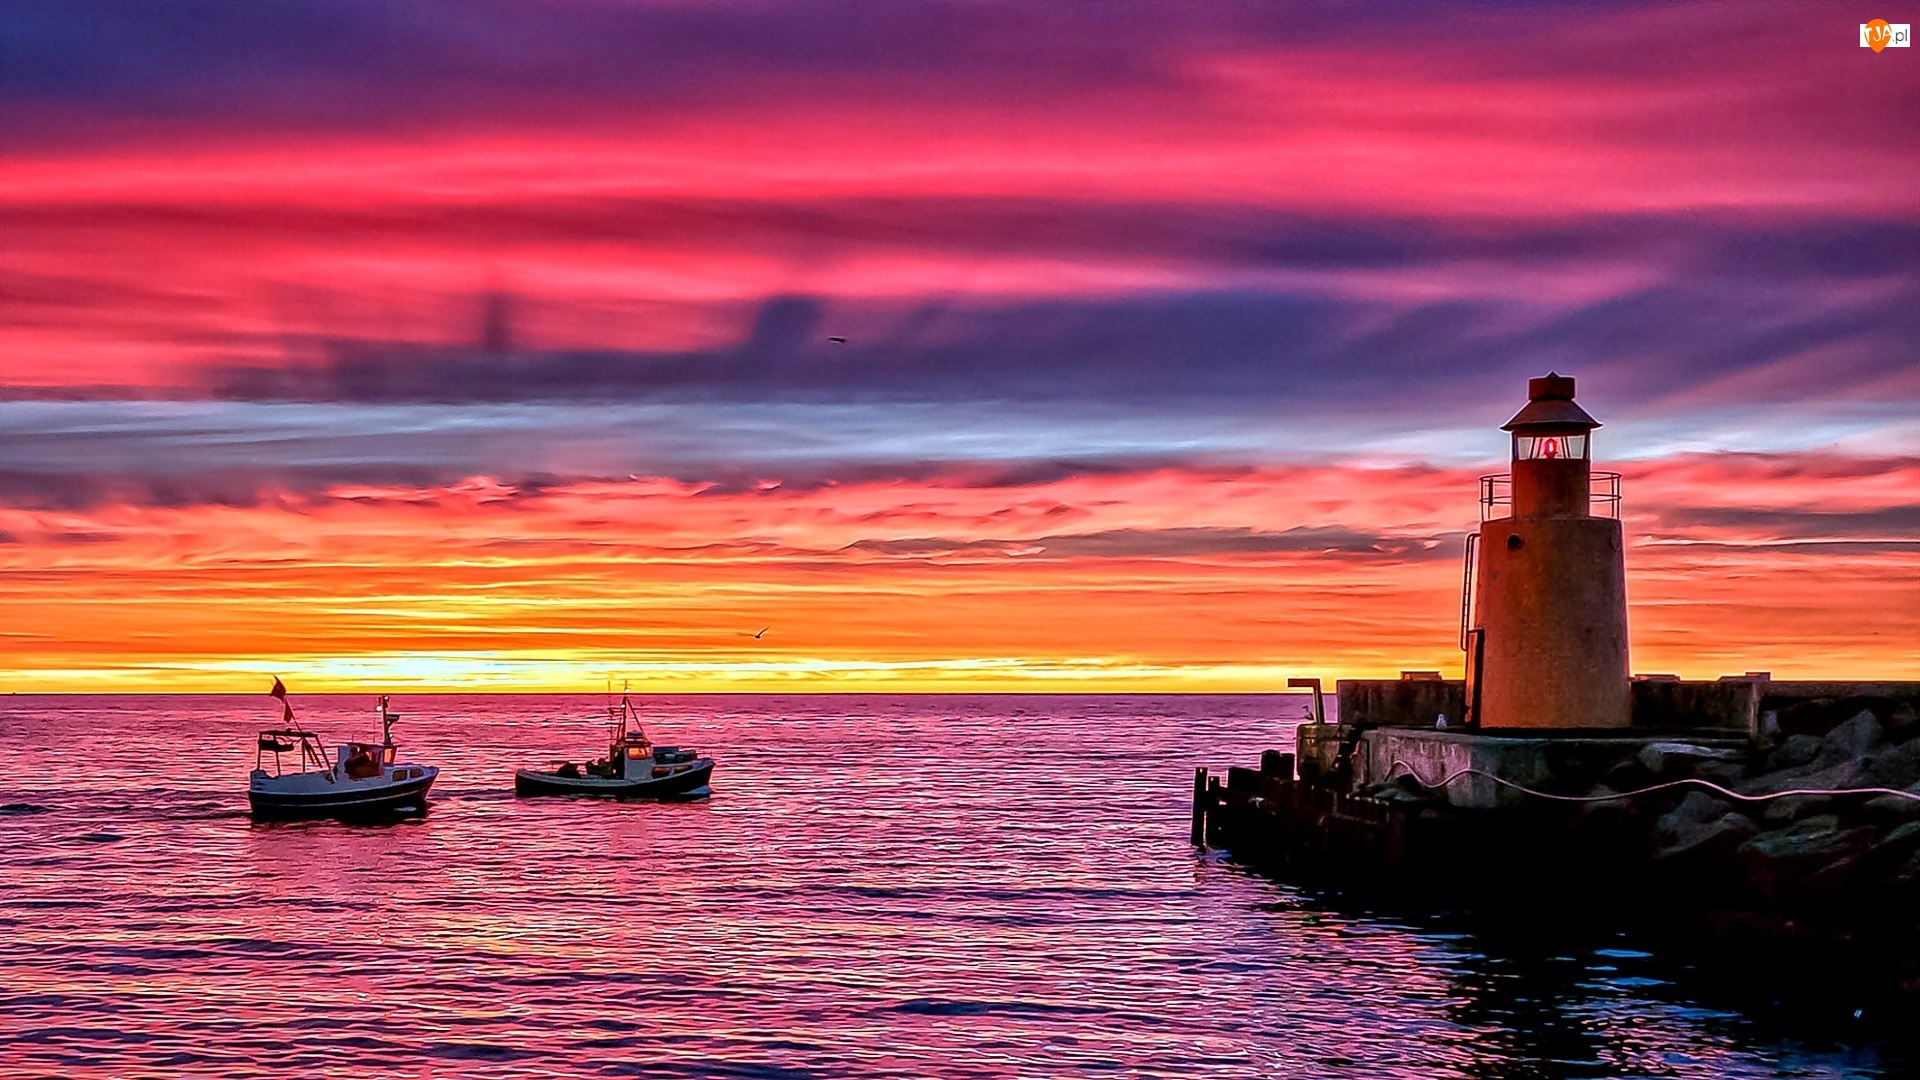 Kutry, Zachód Słońca, Latarnia, Morze, Morska